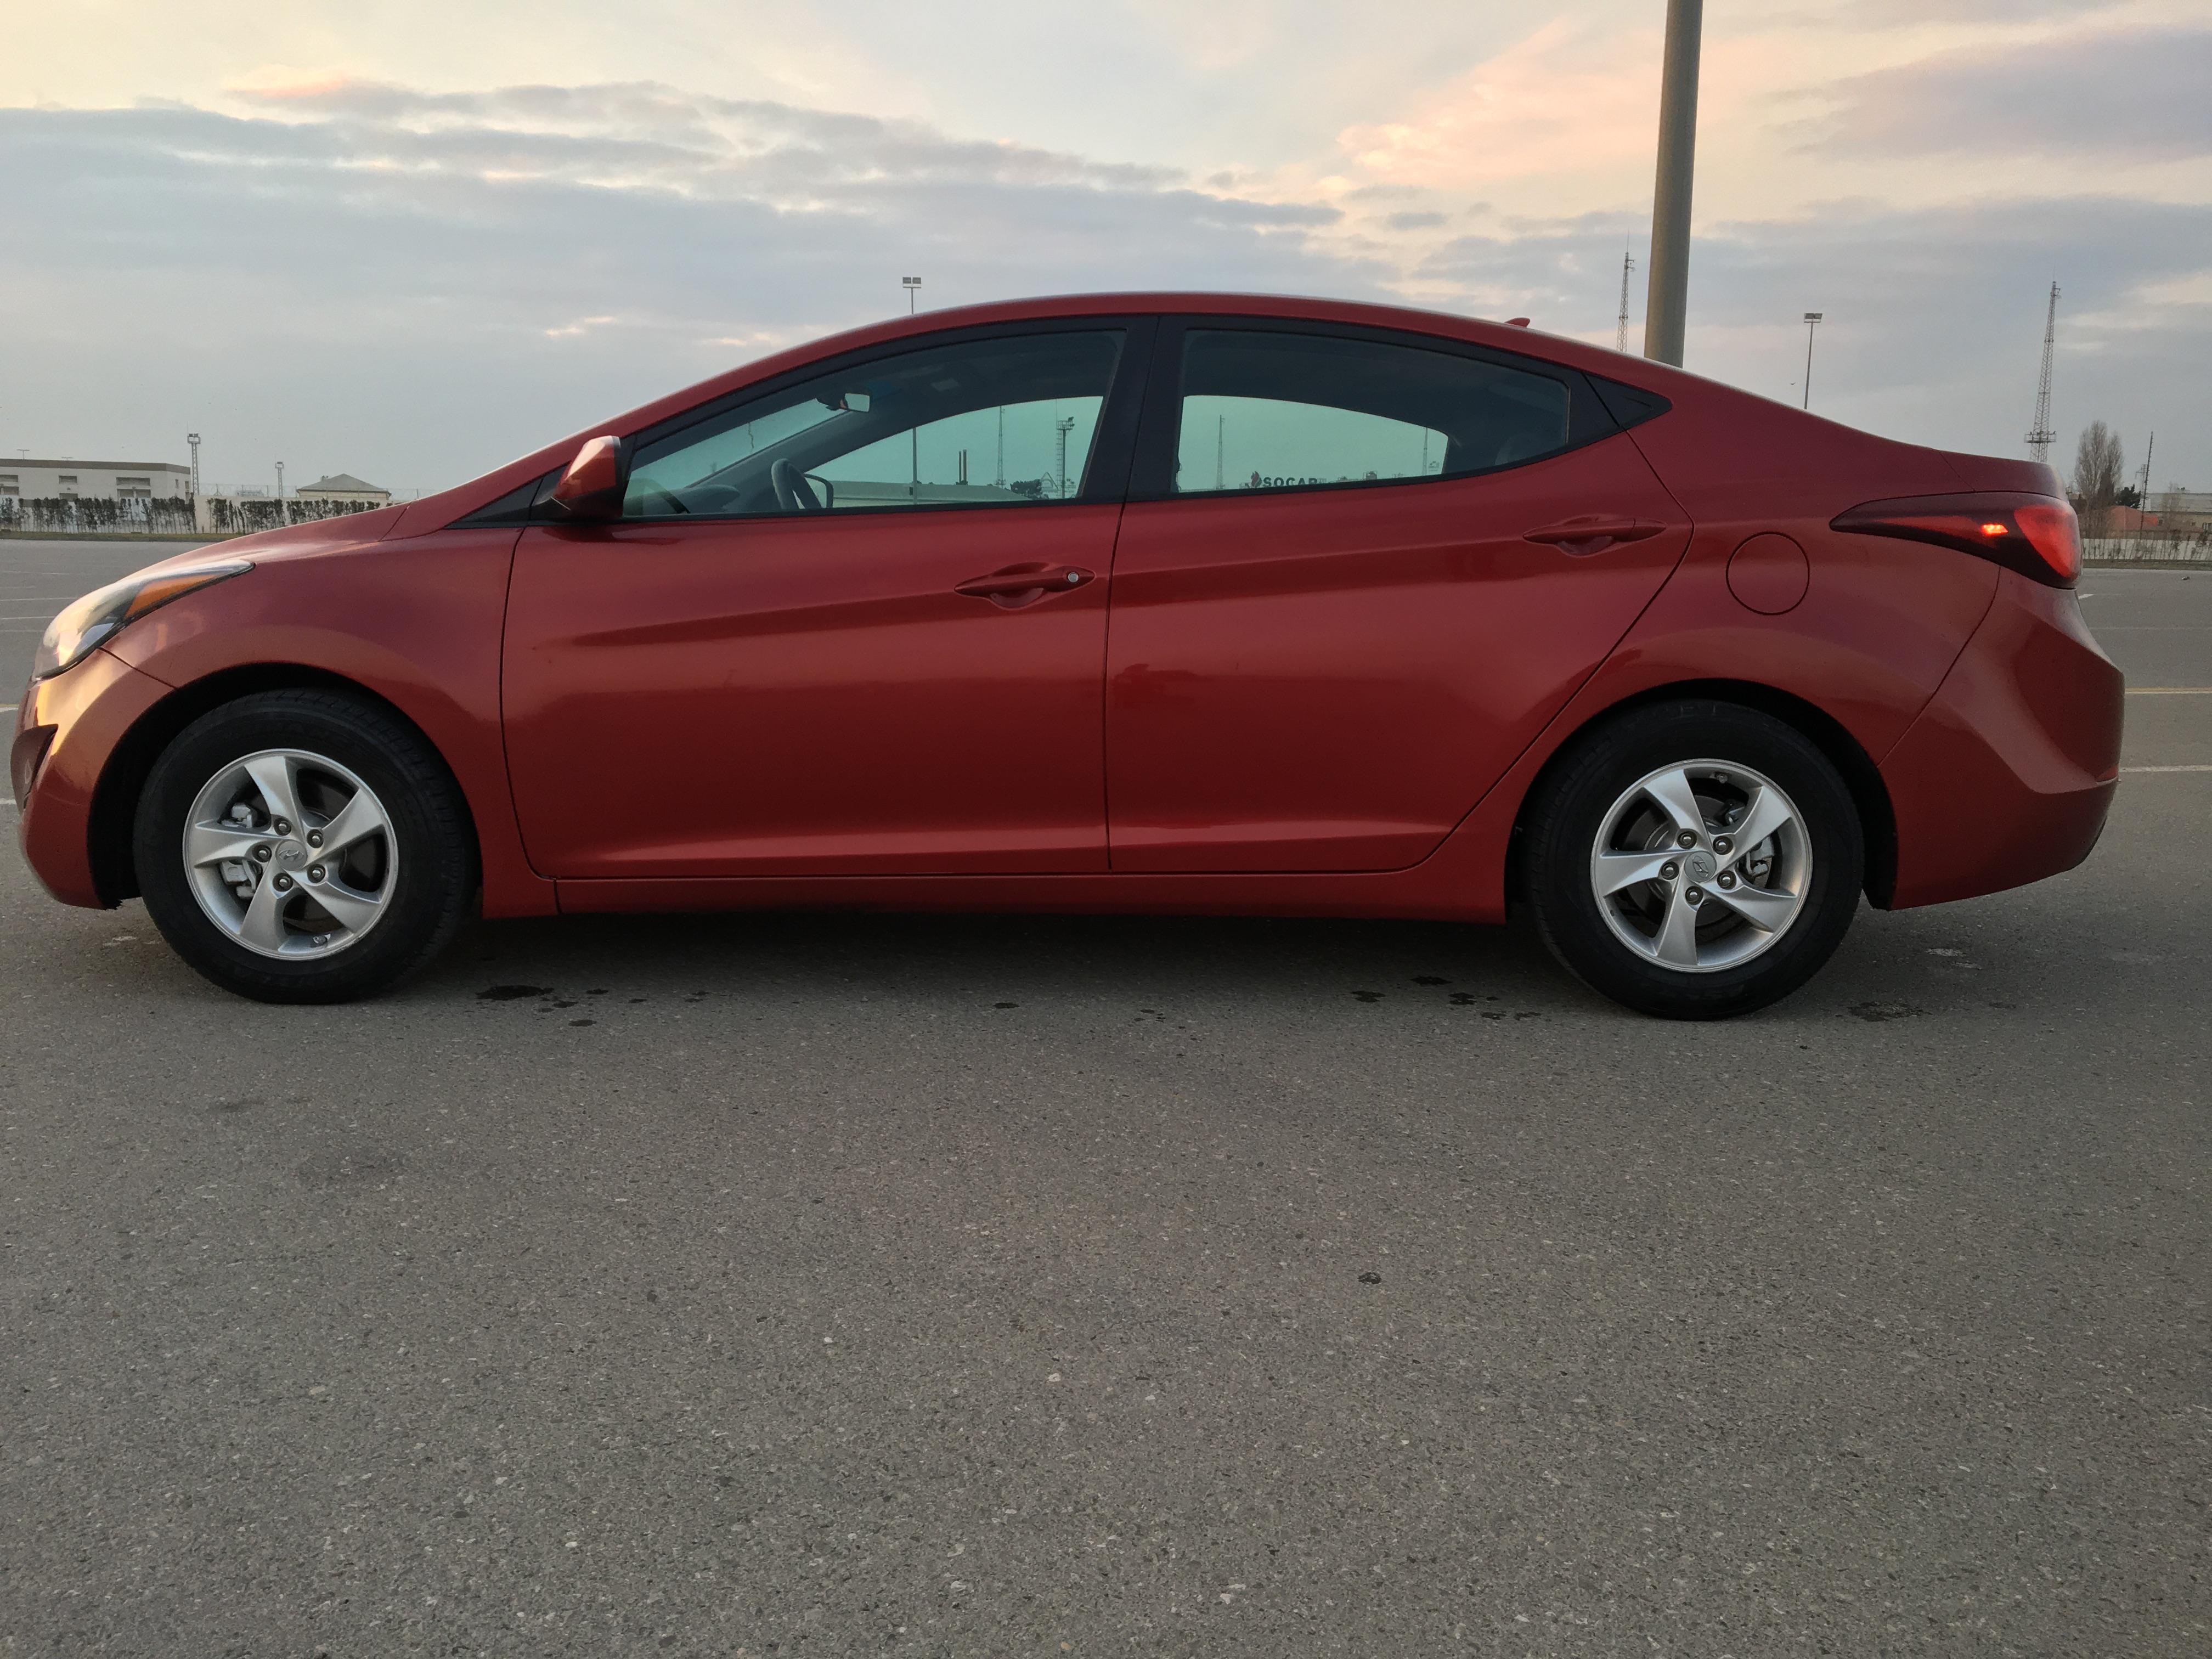 Hyundai Elantra 1.8(lt) 2013 İkinci əl  $10000